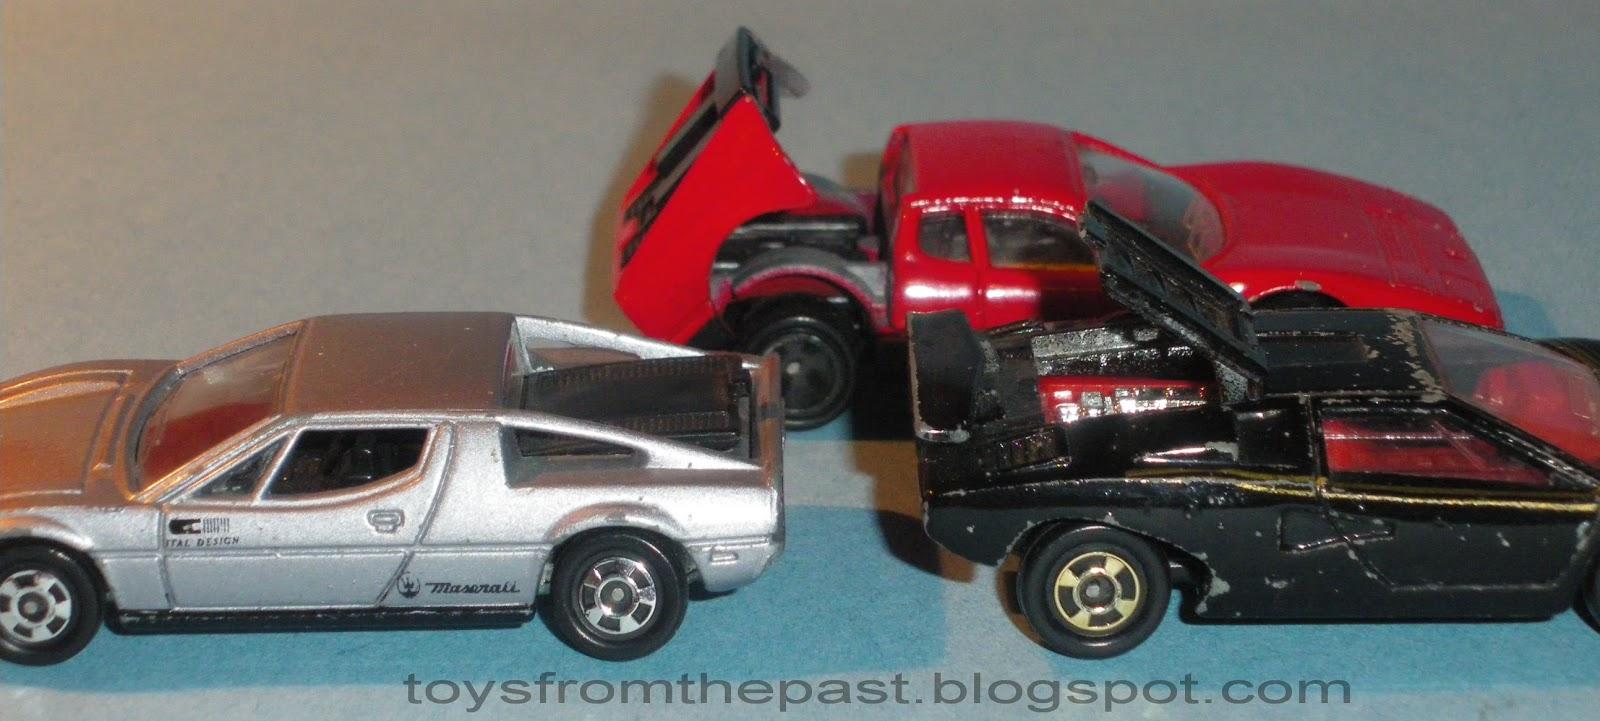 Buy Lamborghini Toy Cars